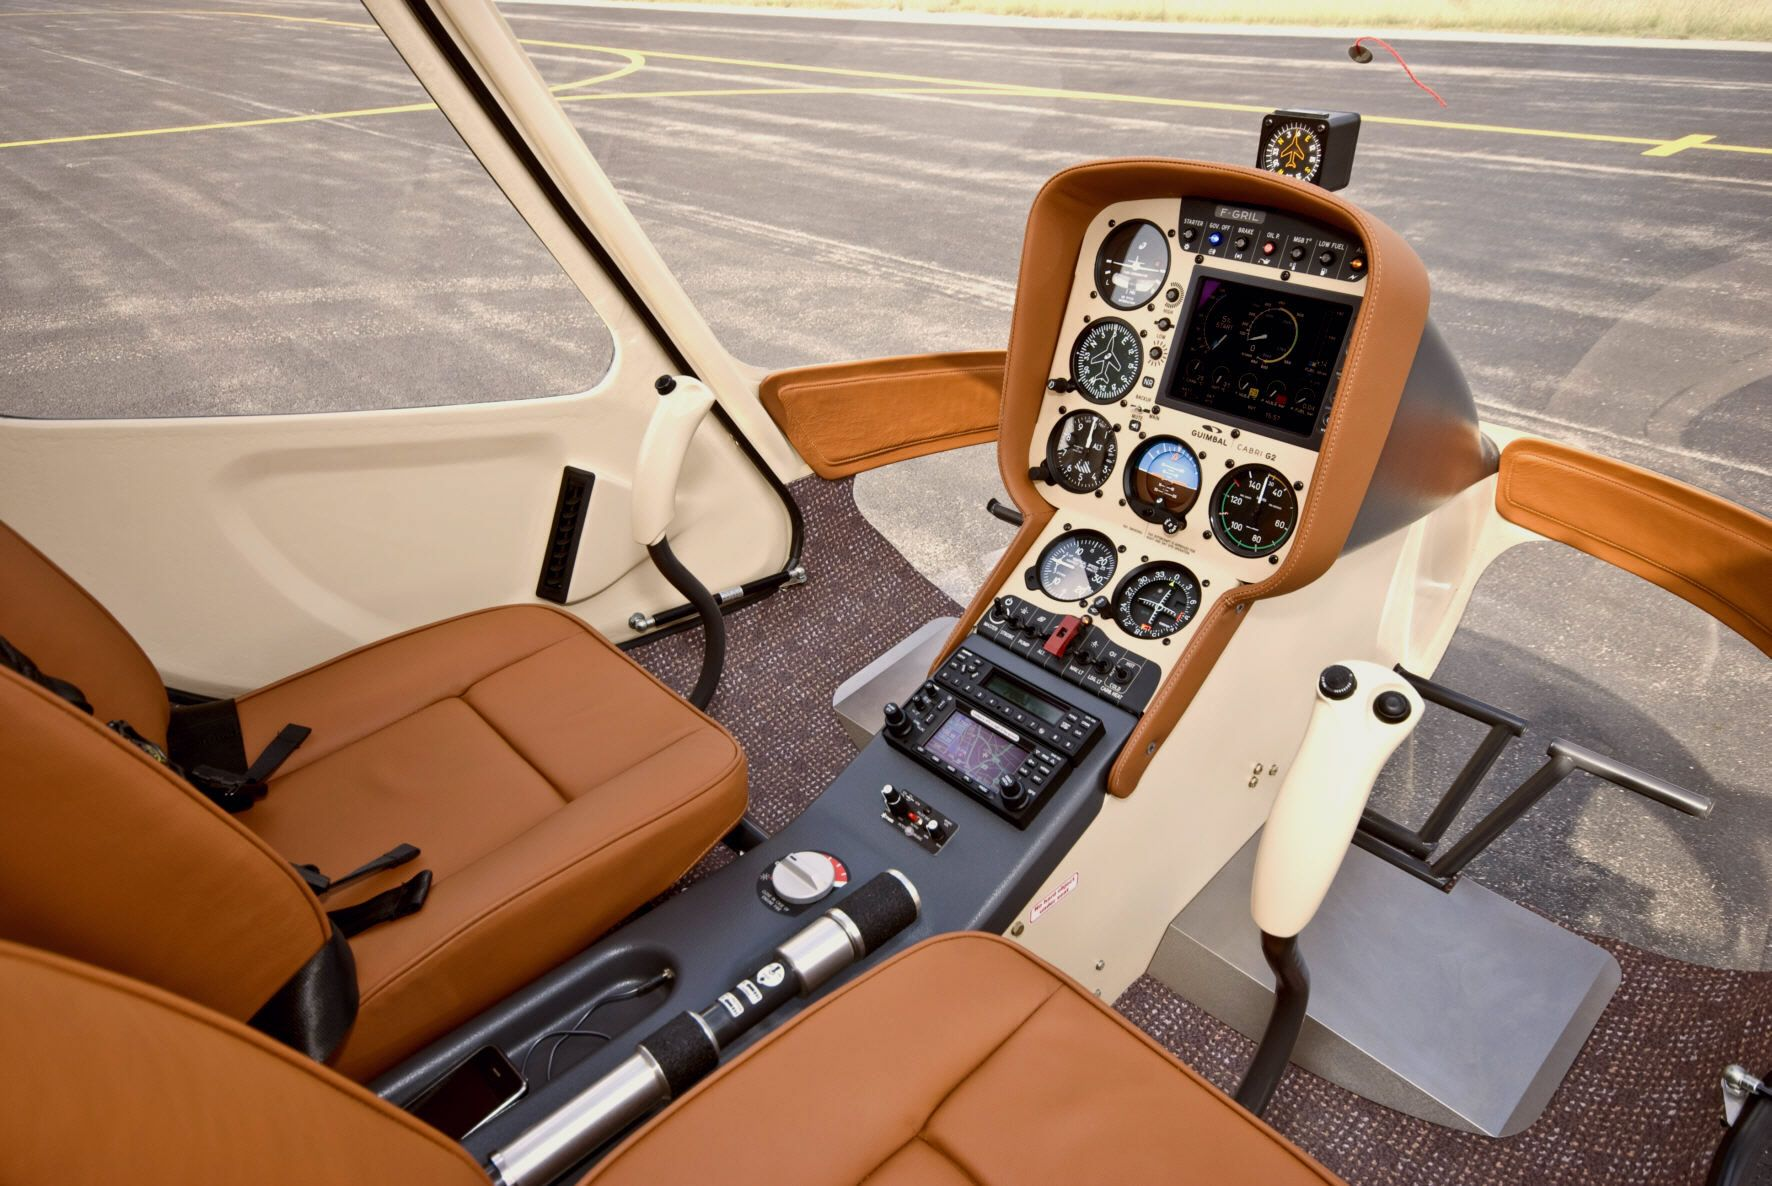 FichierGuimbal Cabri G2 1006 Cockpit